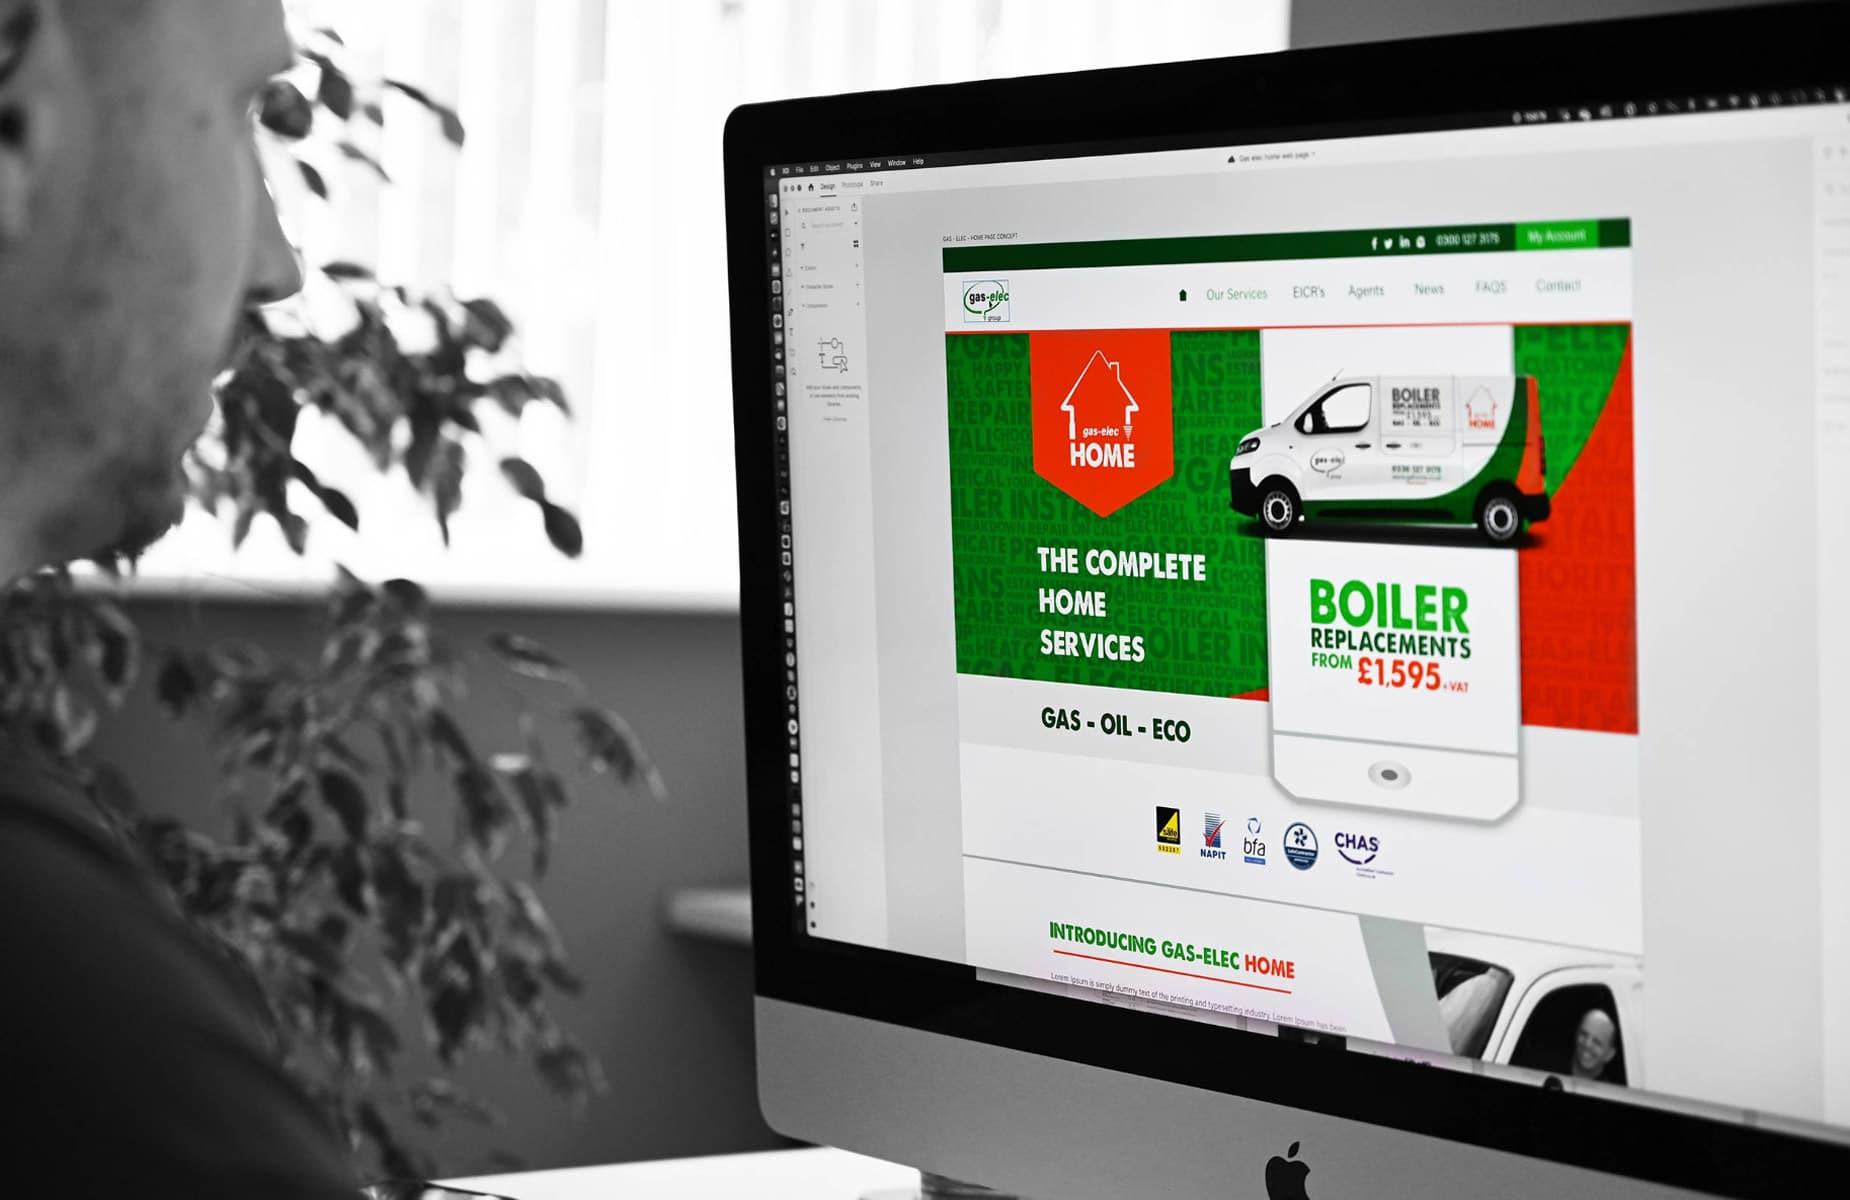 WP Creative, Design and Marketing Agency Suffolk, Website Design, Matt Patrick Designing a Client Website